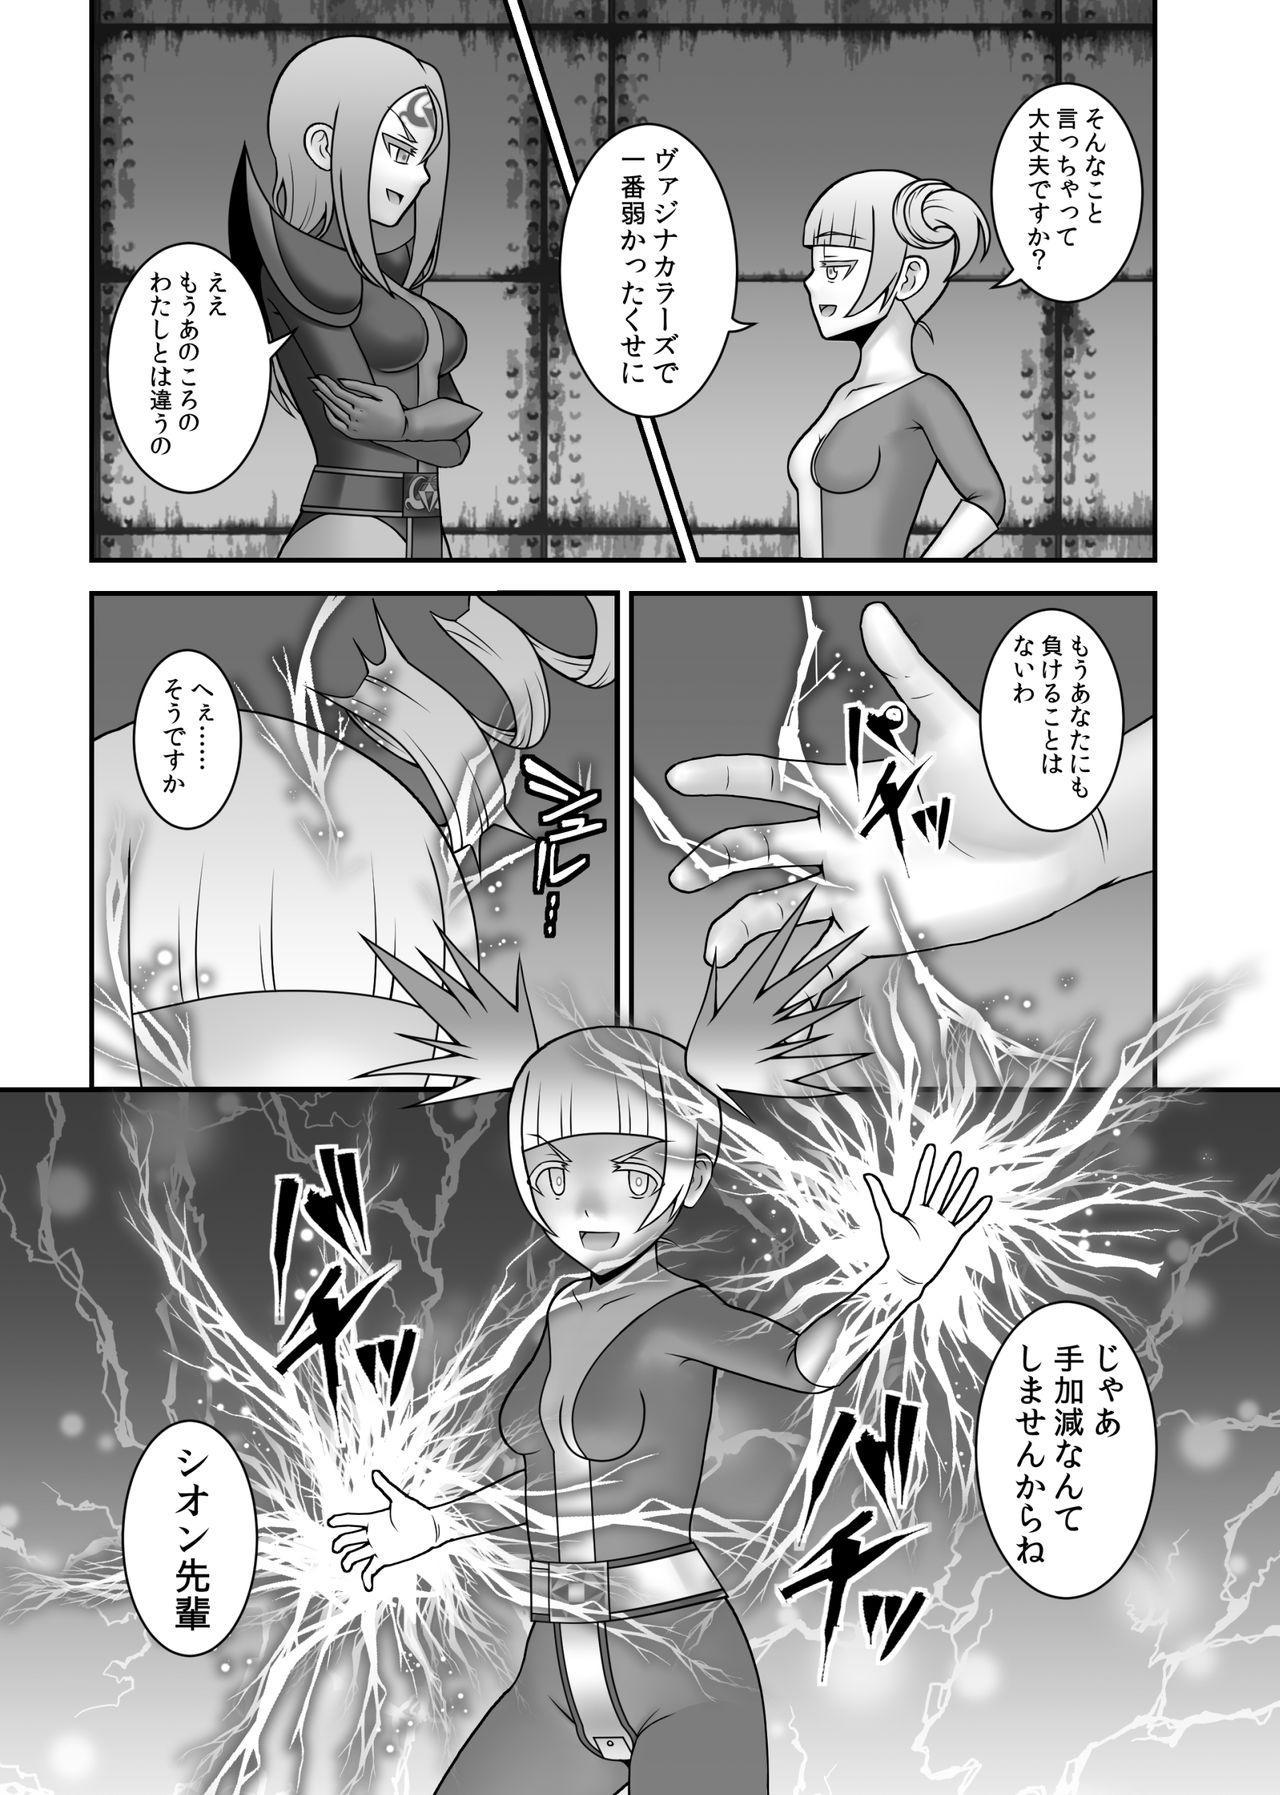 [STUDIO HP+ (IceLee)] Teisou Sentai Virginal Colors Dai-Go-wa 9